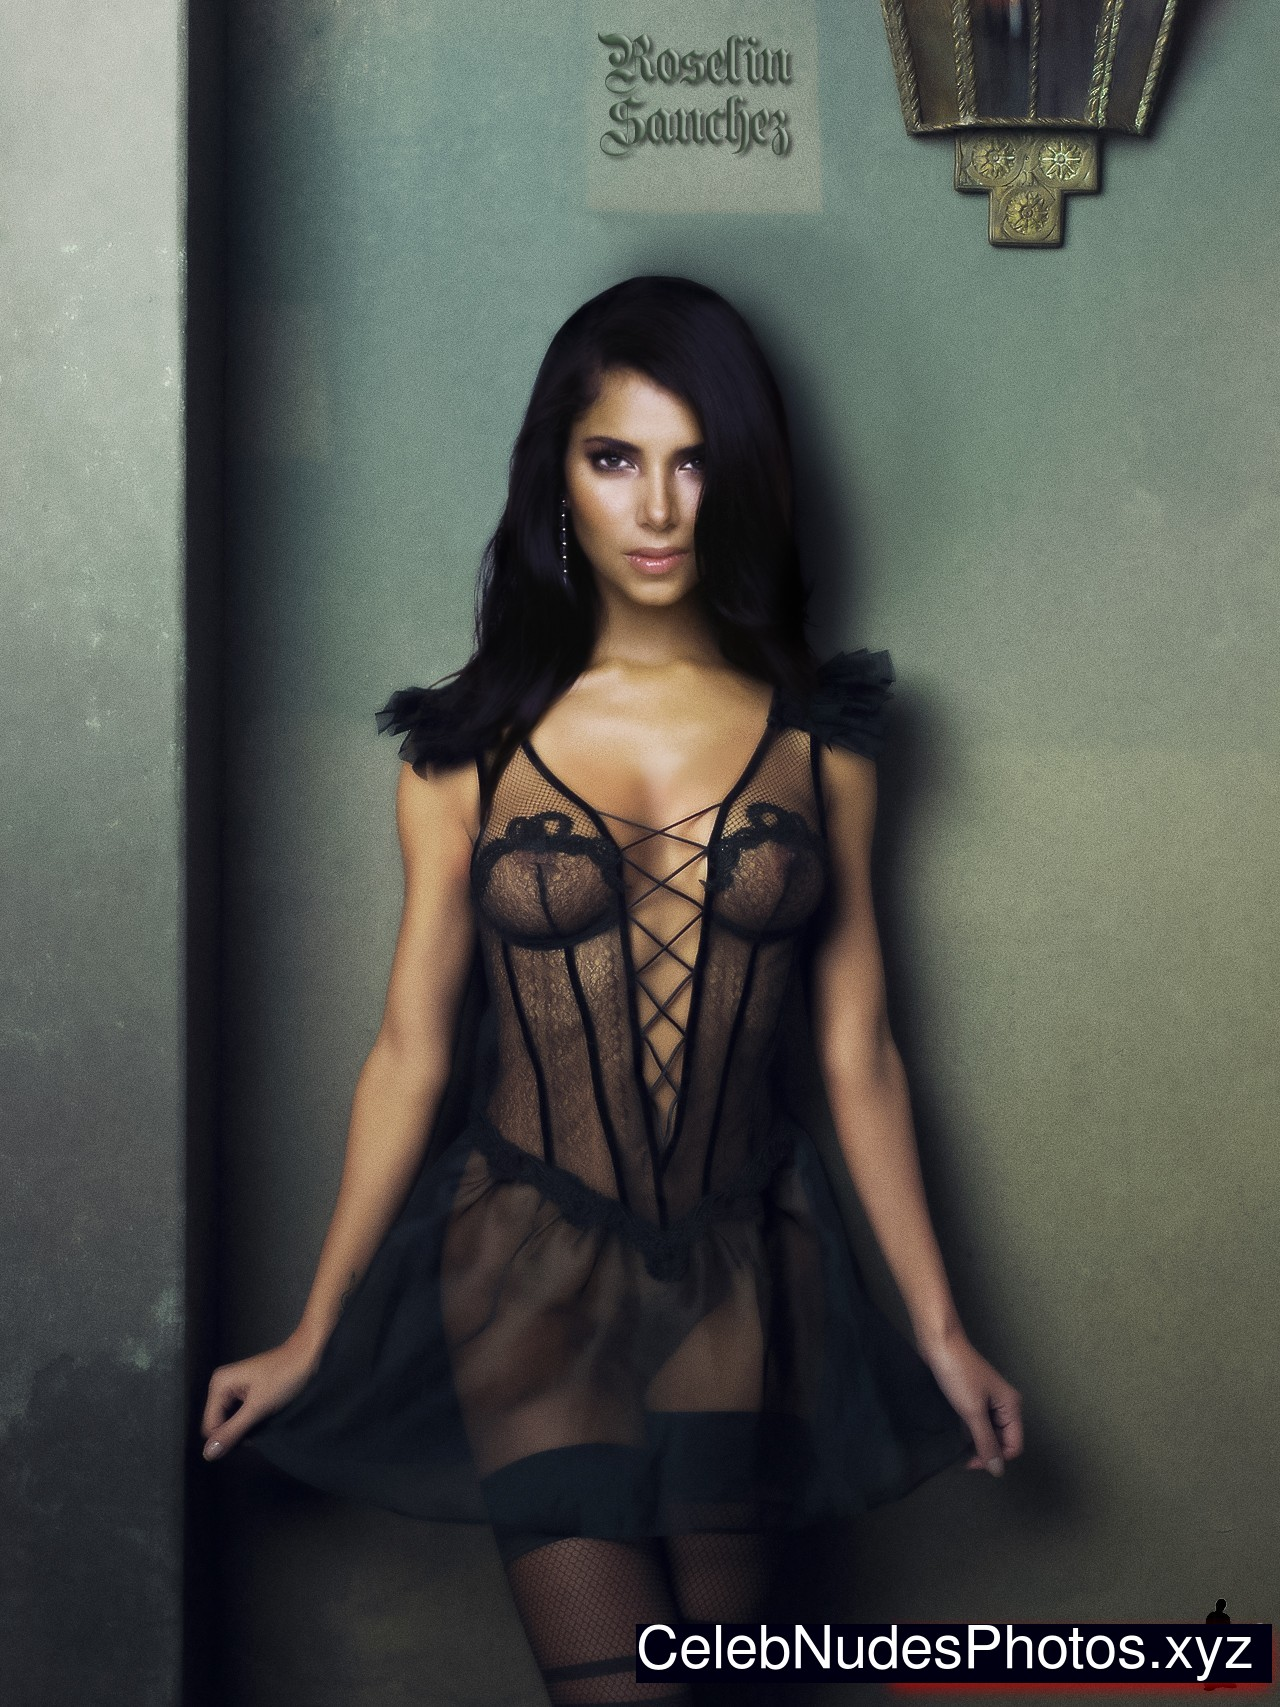 Roselyn Sánchez free nude celebs